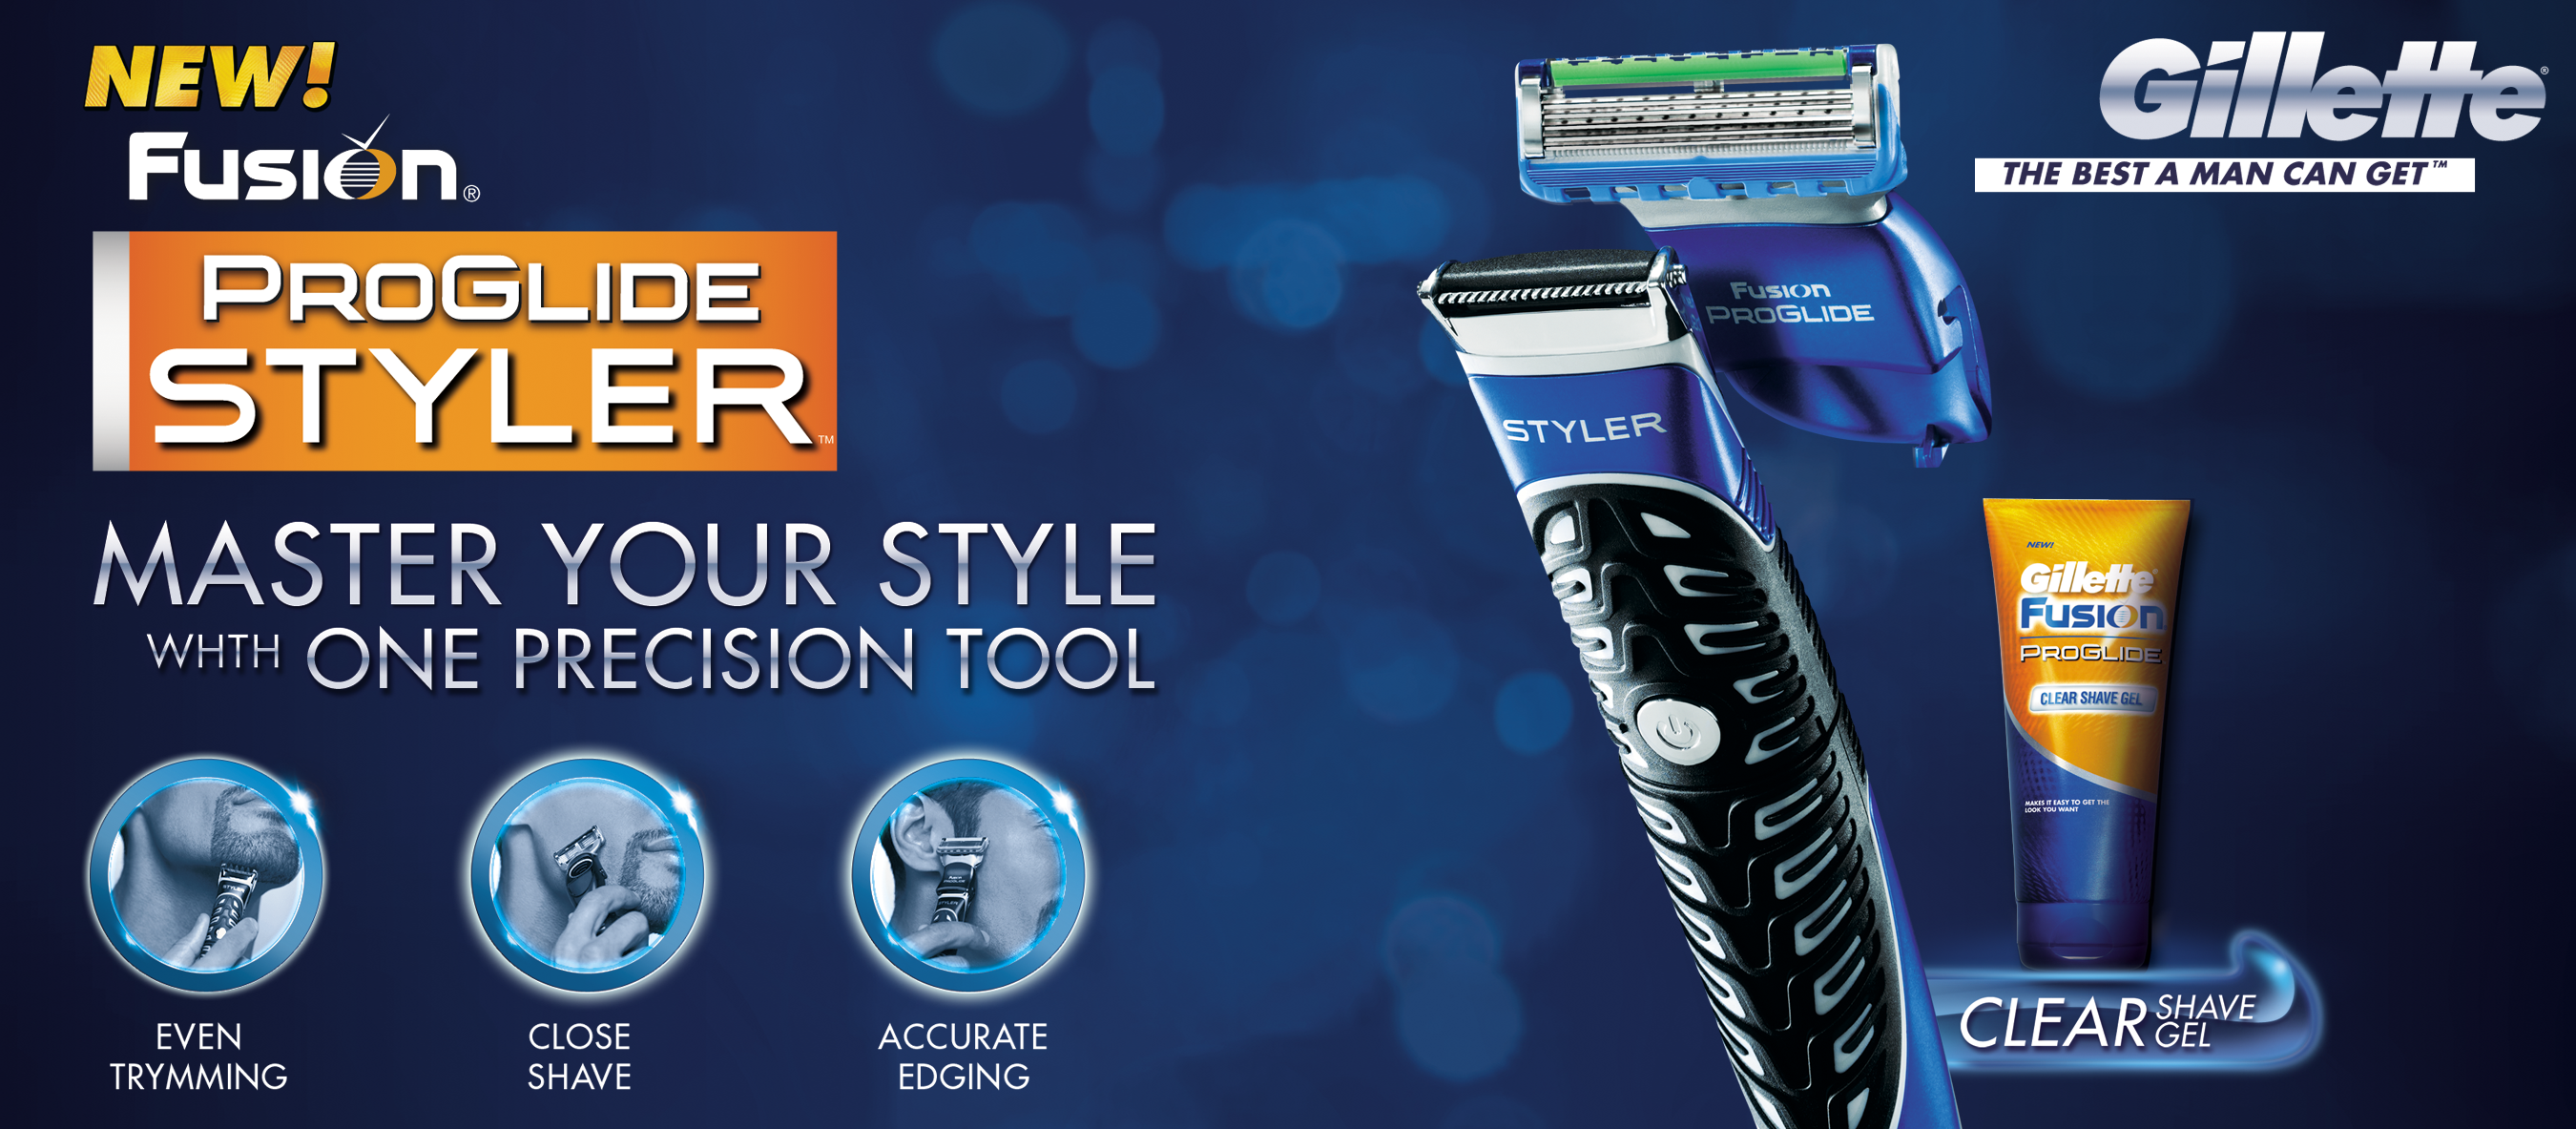 Gillette Fusion Proglide Power Styler 3 Manual Guide